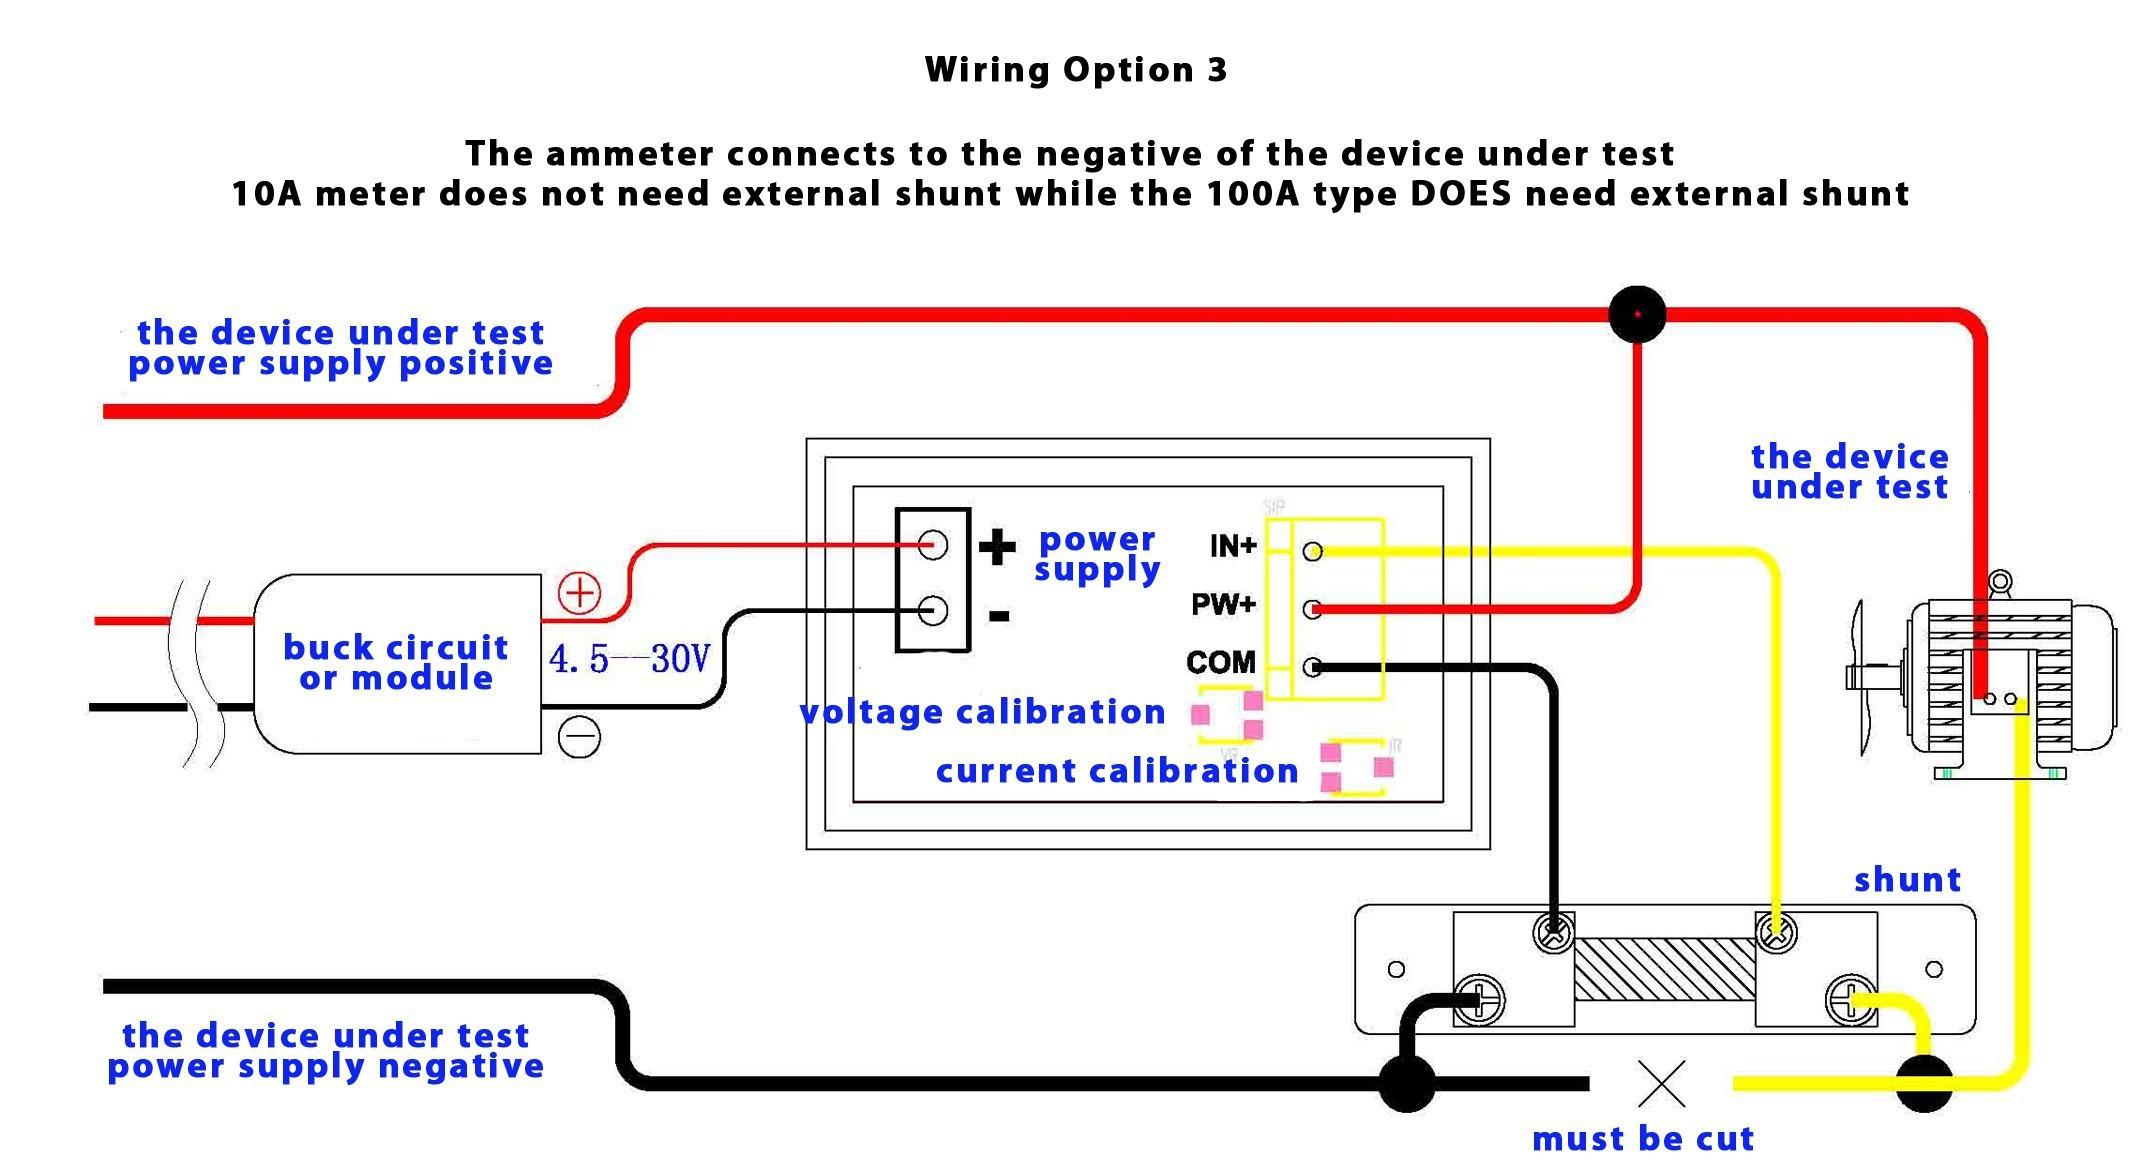 Amp Meter Wiring Diagram New | Wiring Diagram Image on 200 amp breaker diagram, amp meter shunt diagram, 200 amp disconnect diagram, 200 amp wire diagram, 200 amp panel diagram,